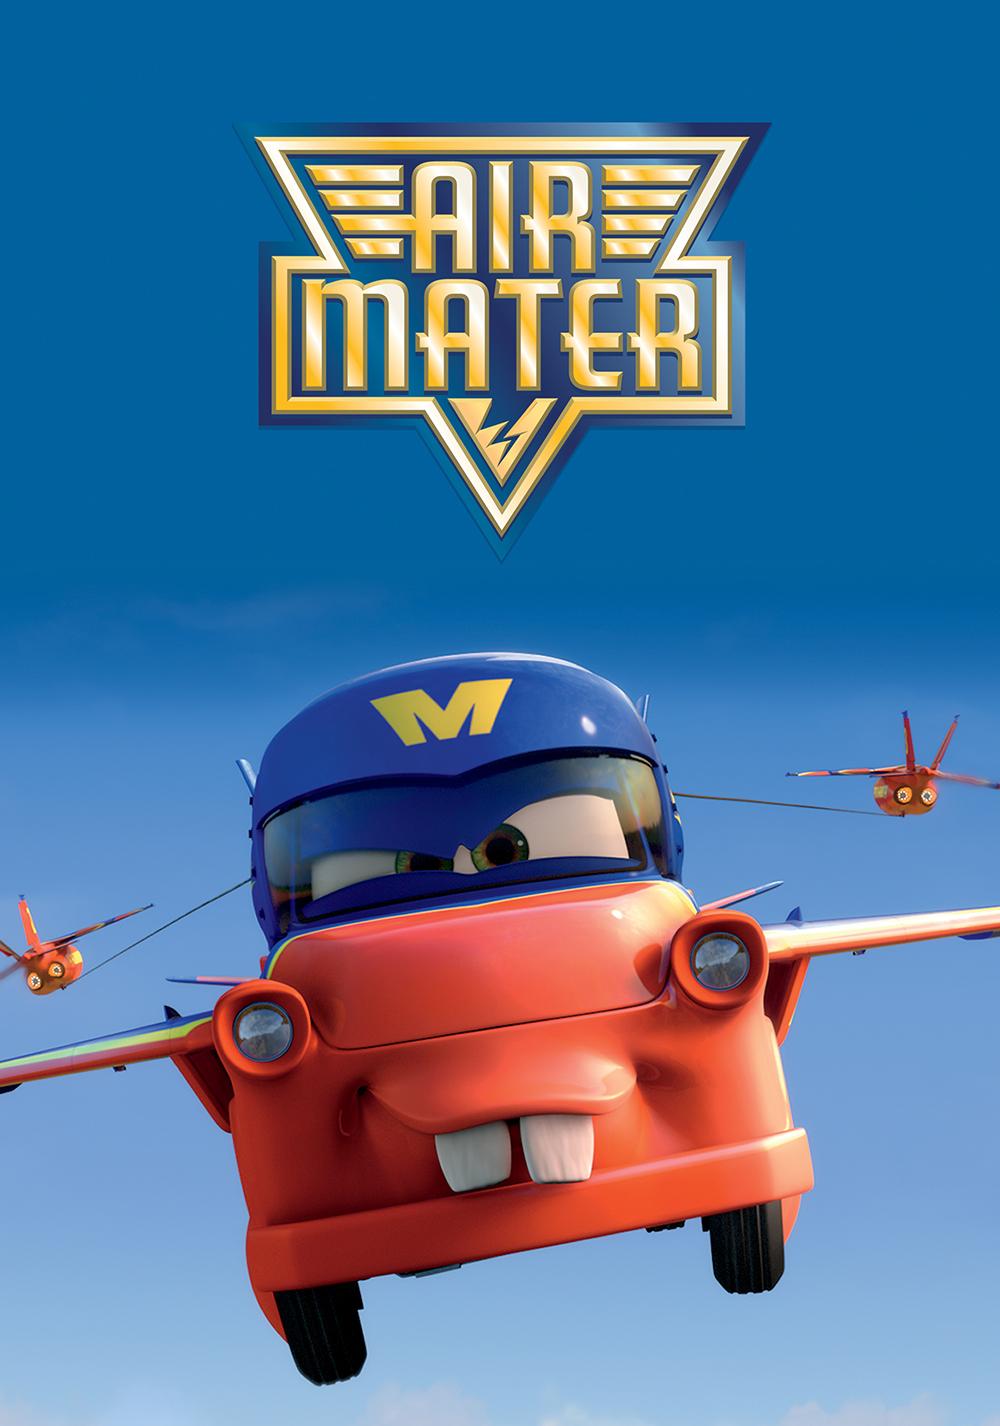 Pixar disney cars toon air martin mater affiche poster